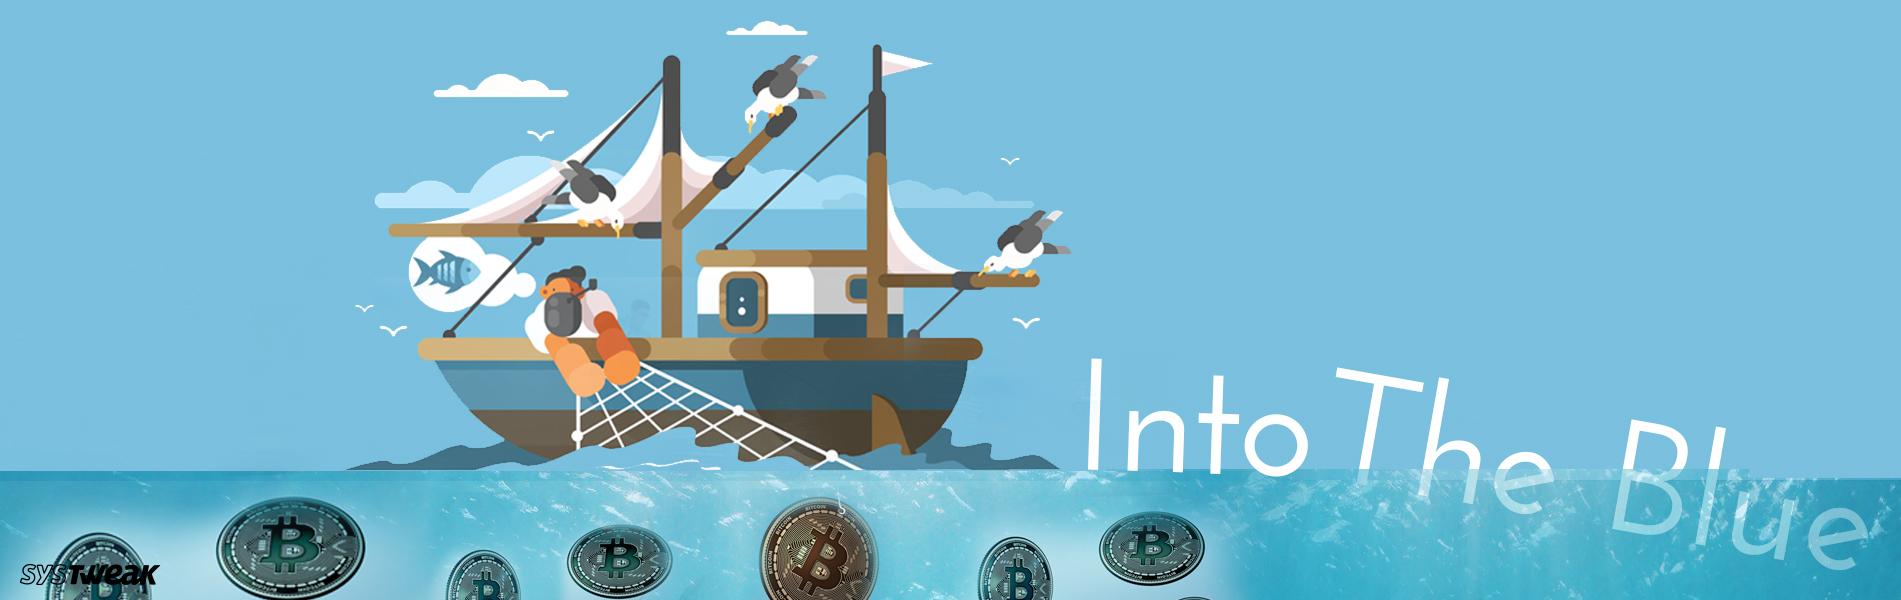 Blockchain Revamping the Blue Economy